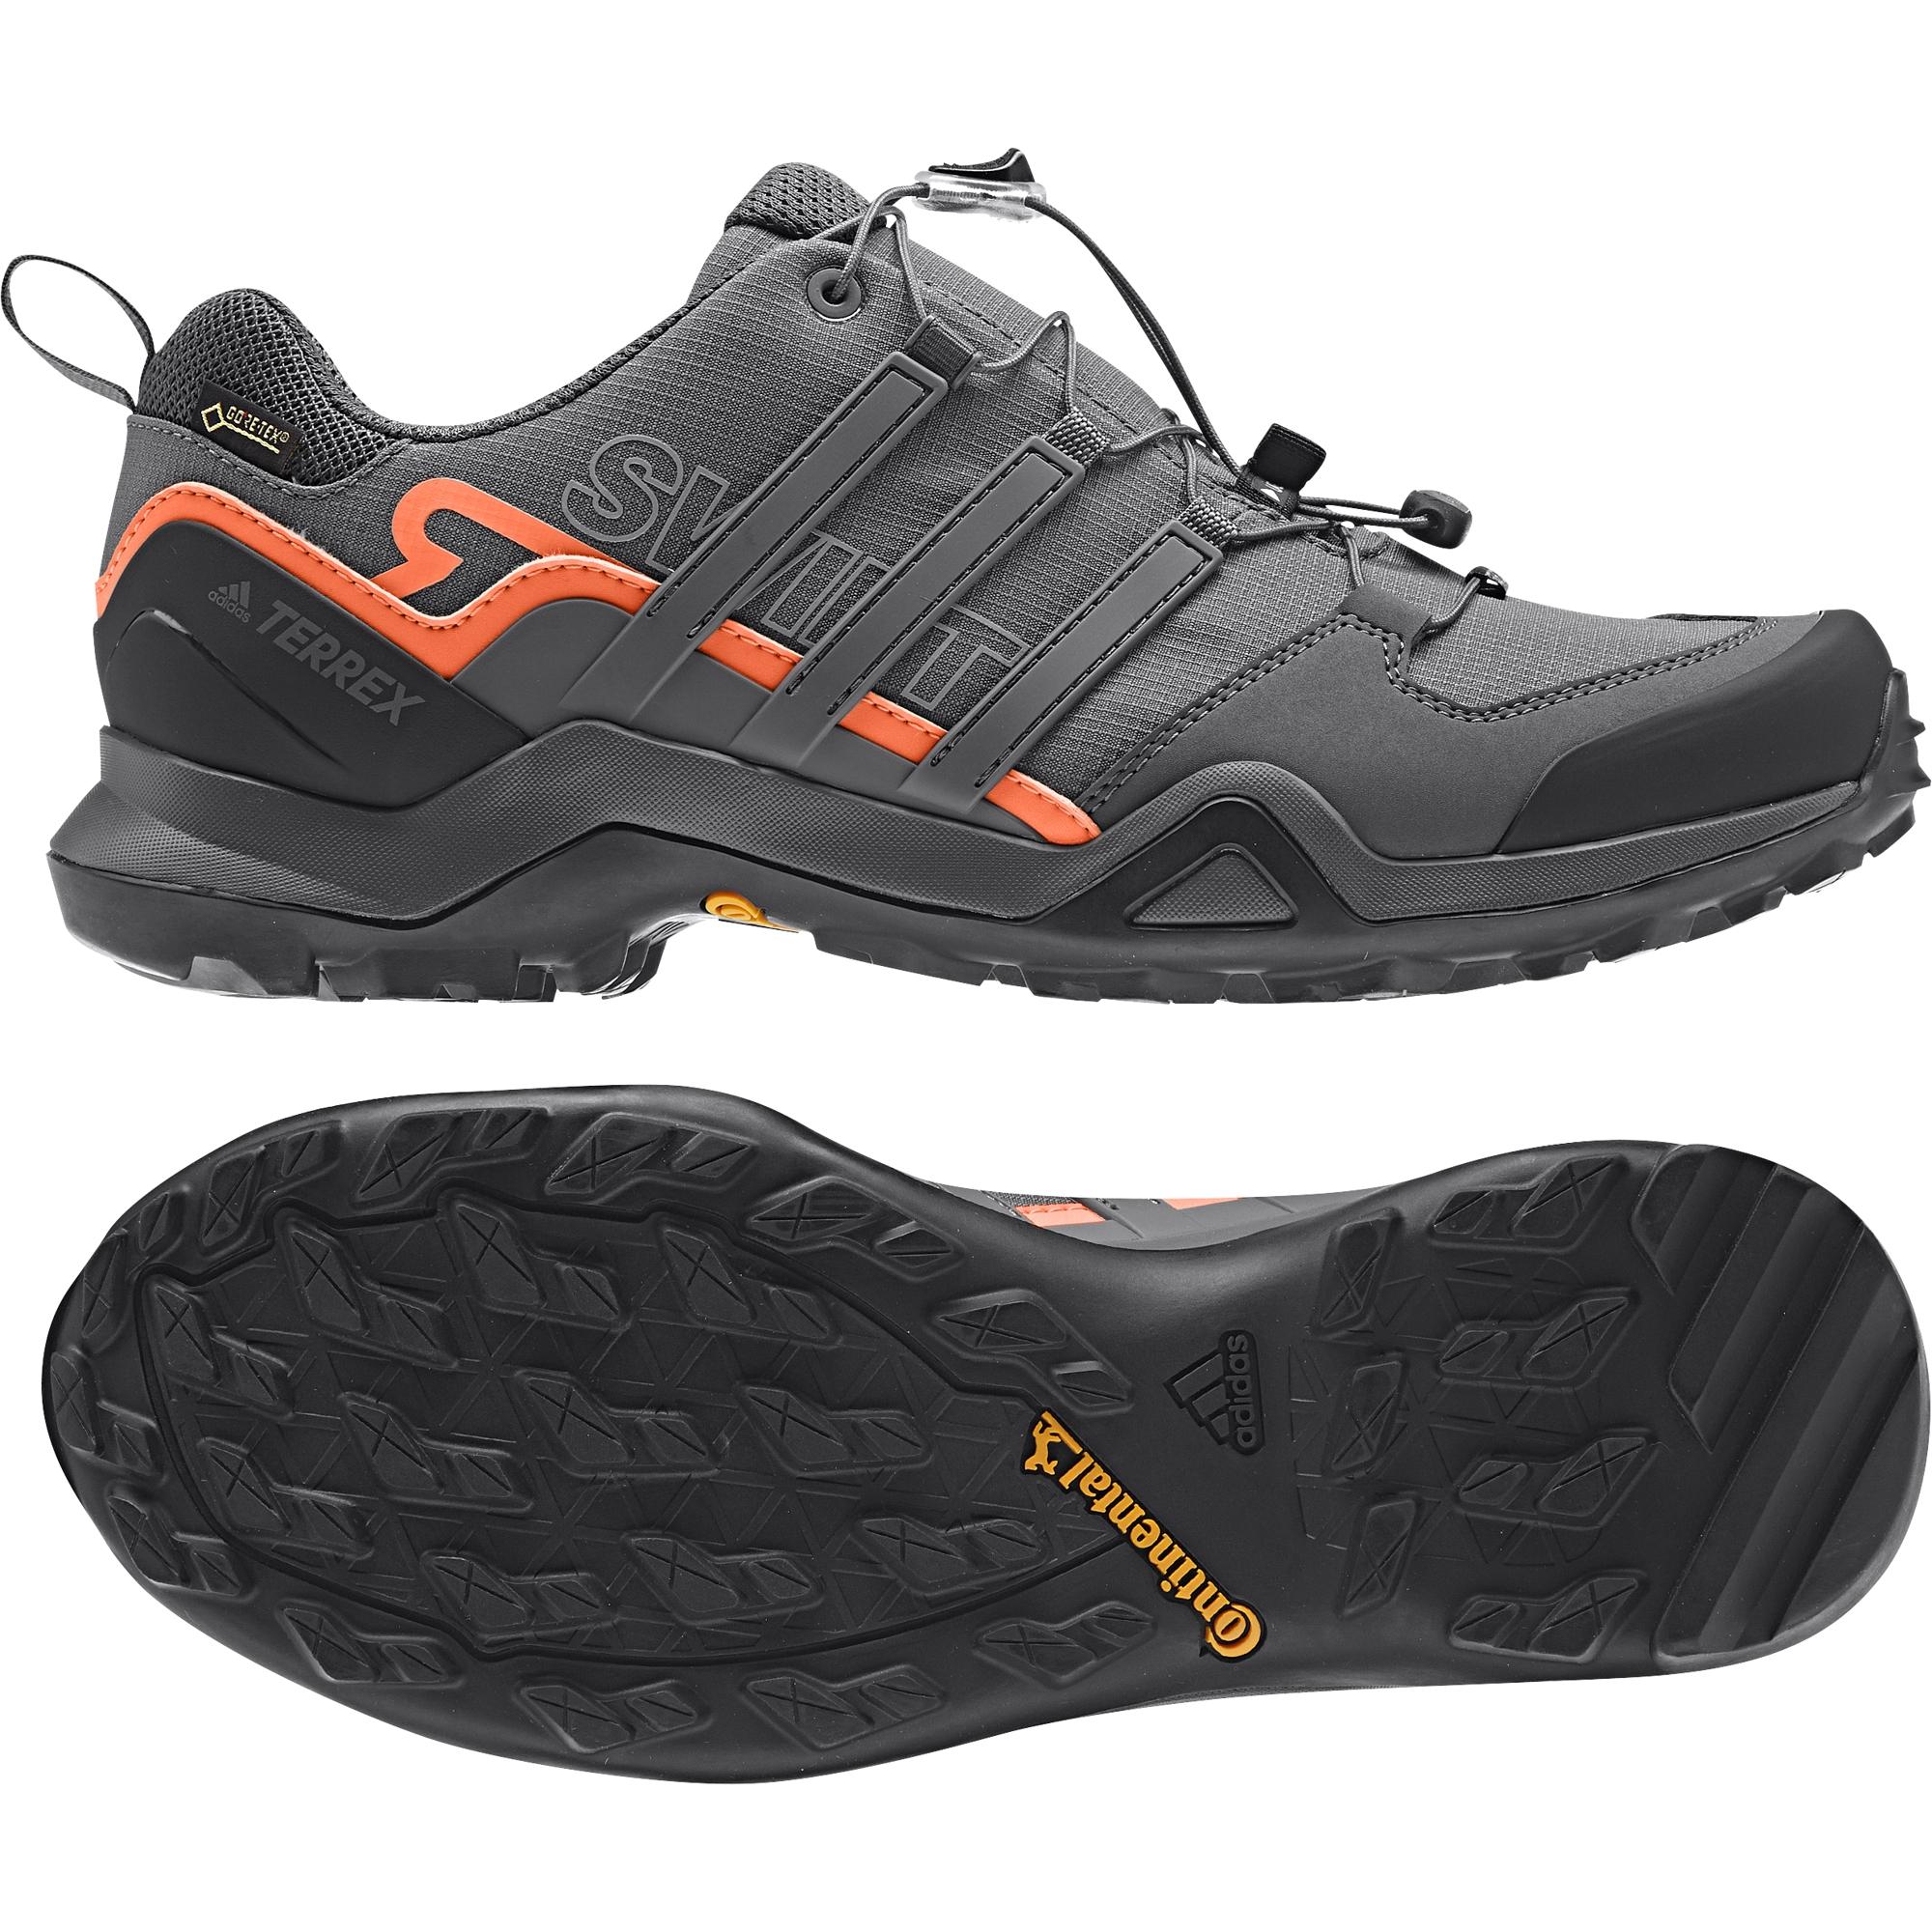 15cd51b3b71a Chaussures adidas Terrex Swift R2 GTX